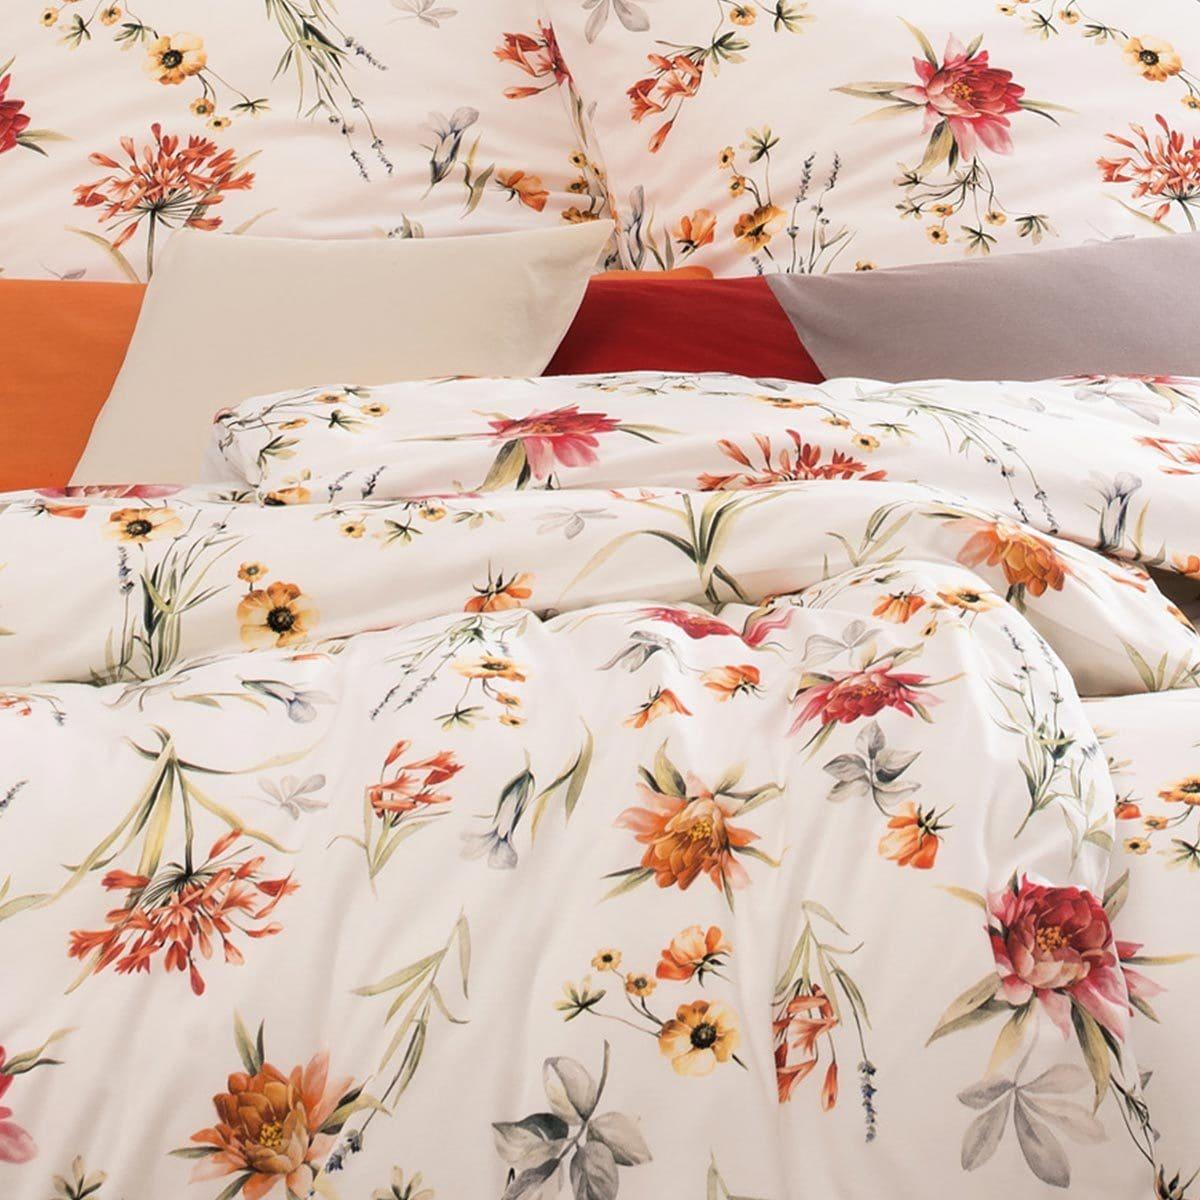 estella mako interlock jersey bettw sche 6743 230 natur. Black Bedroom Furniture Sets. Home Design Ideas